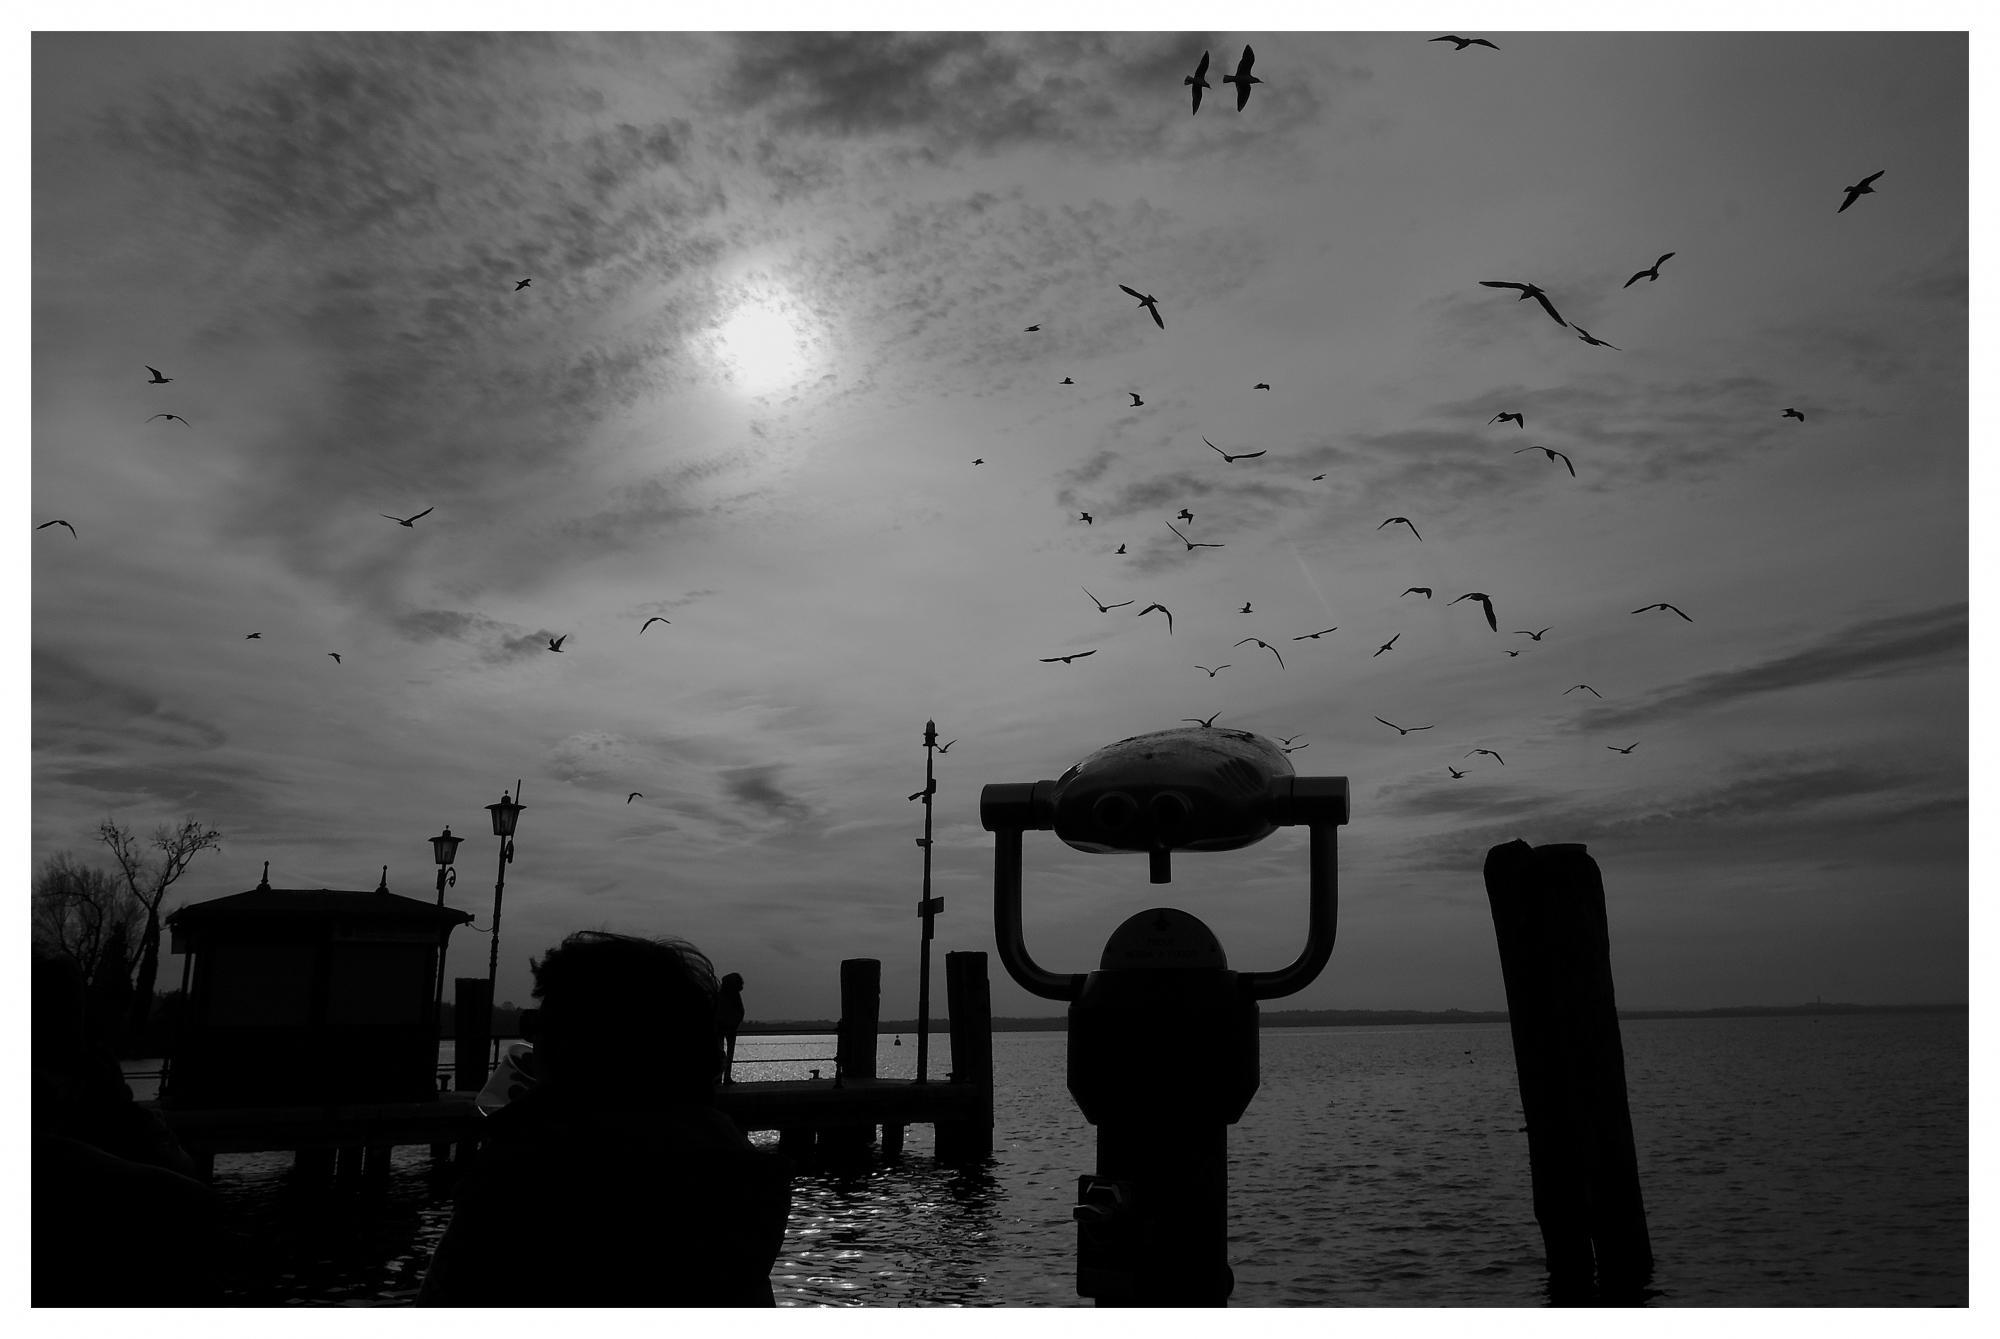 Sirminone lago di Garda gennaio 2020 I